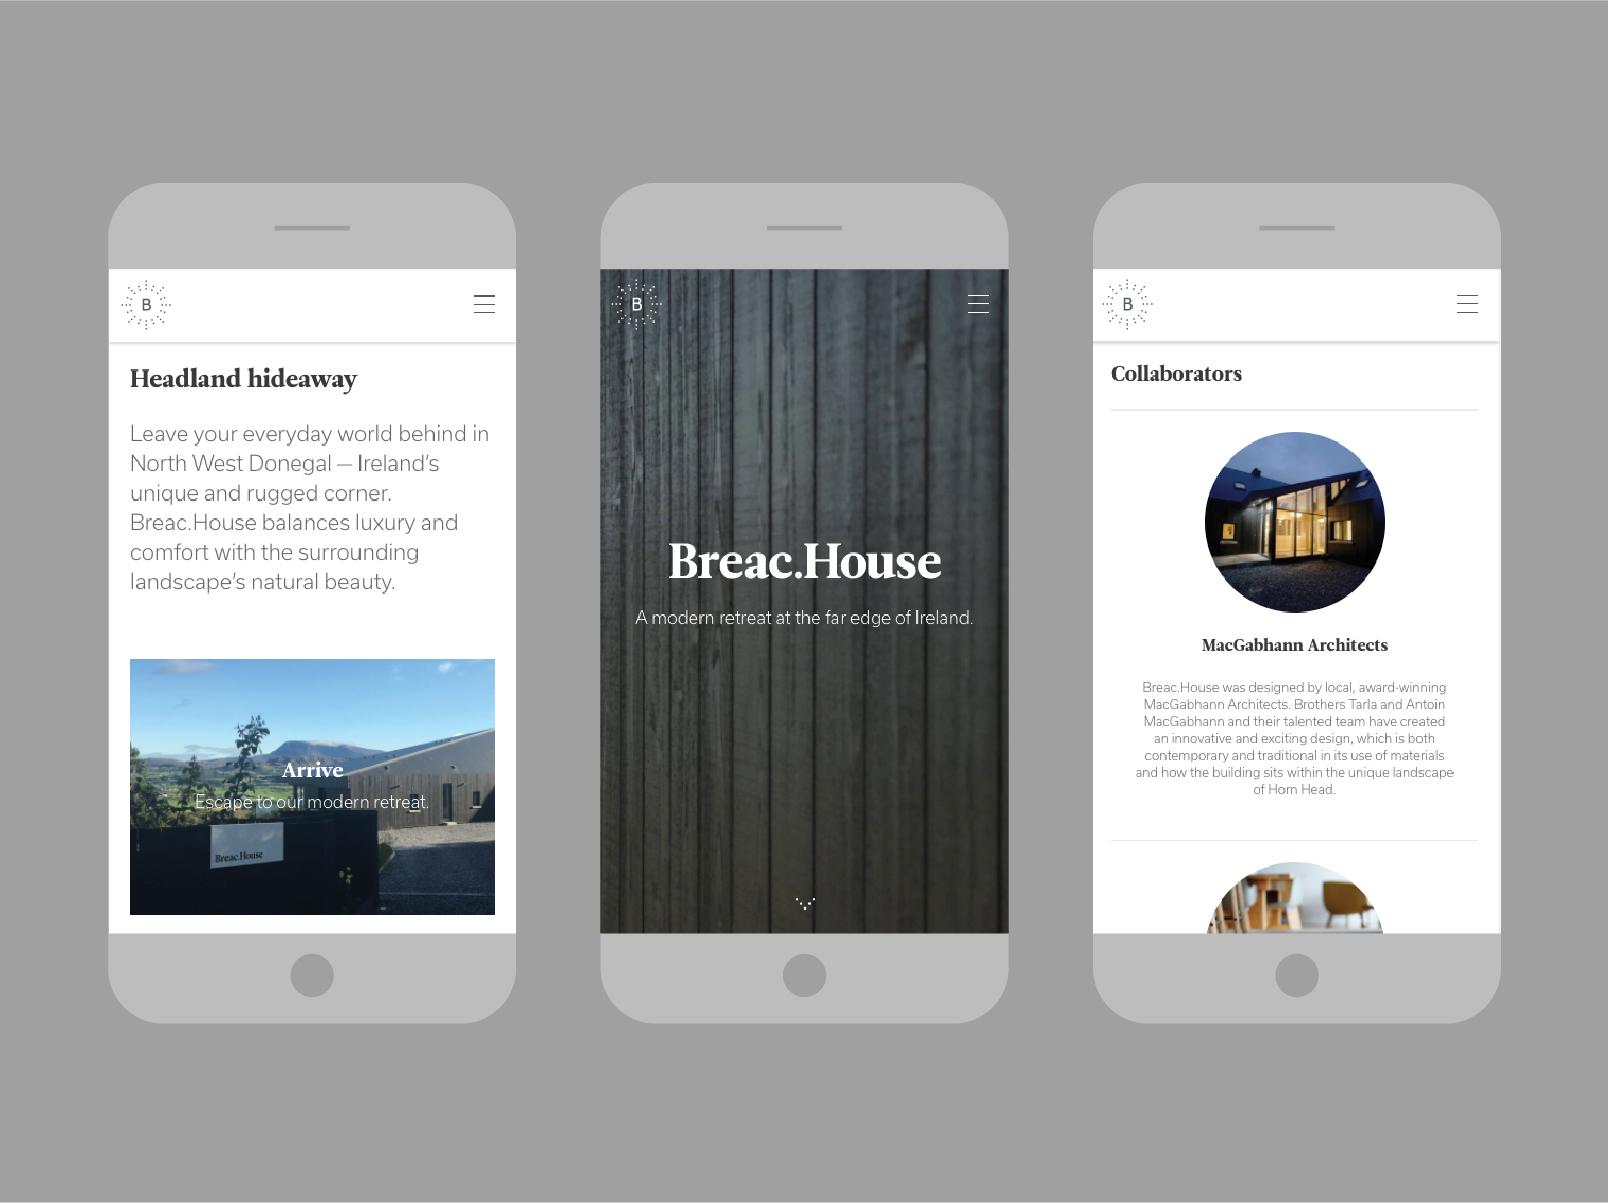 Breac.House